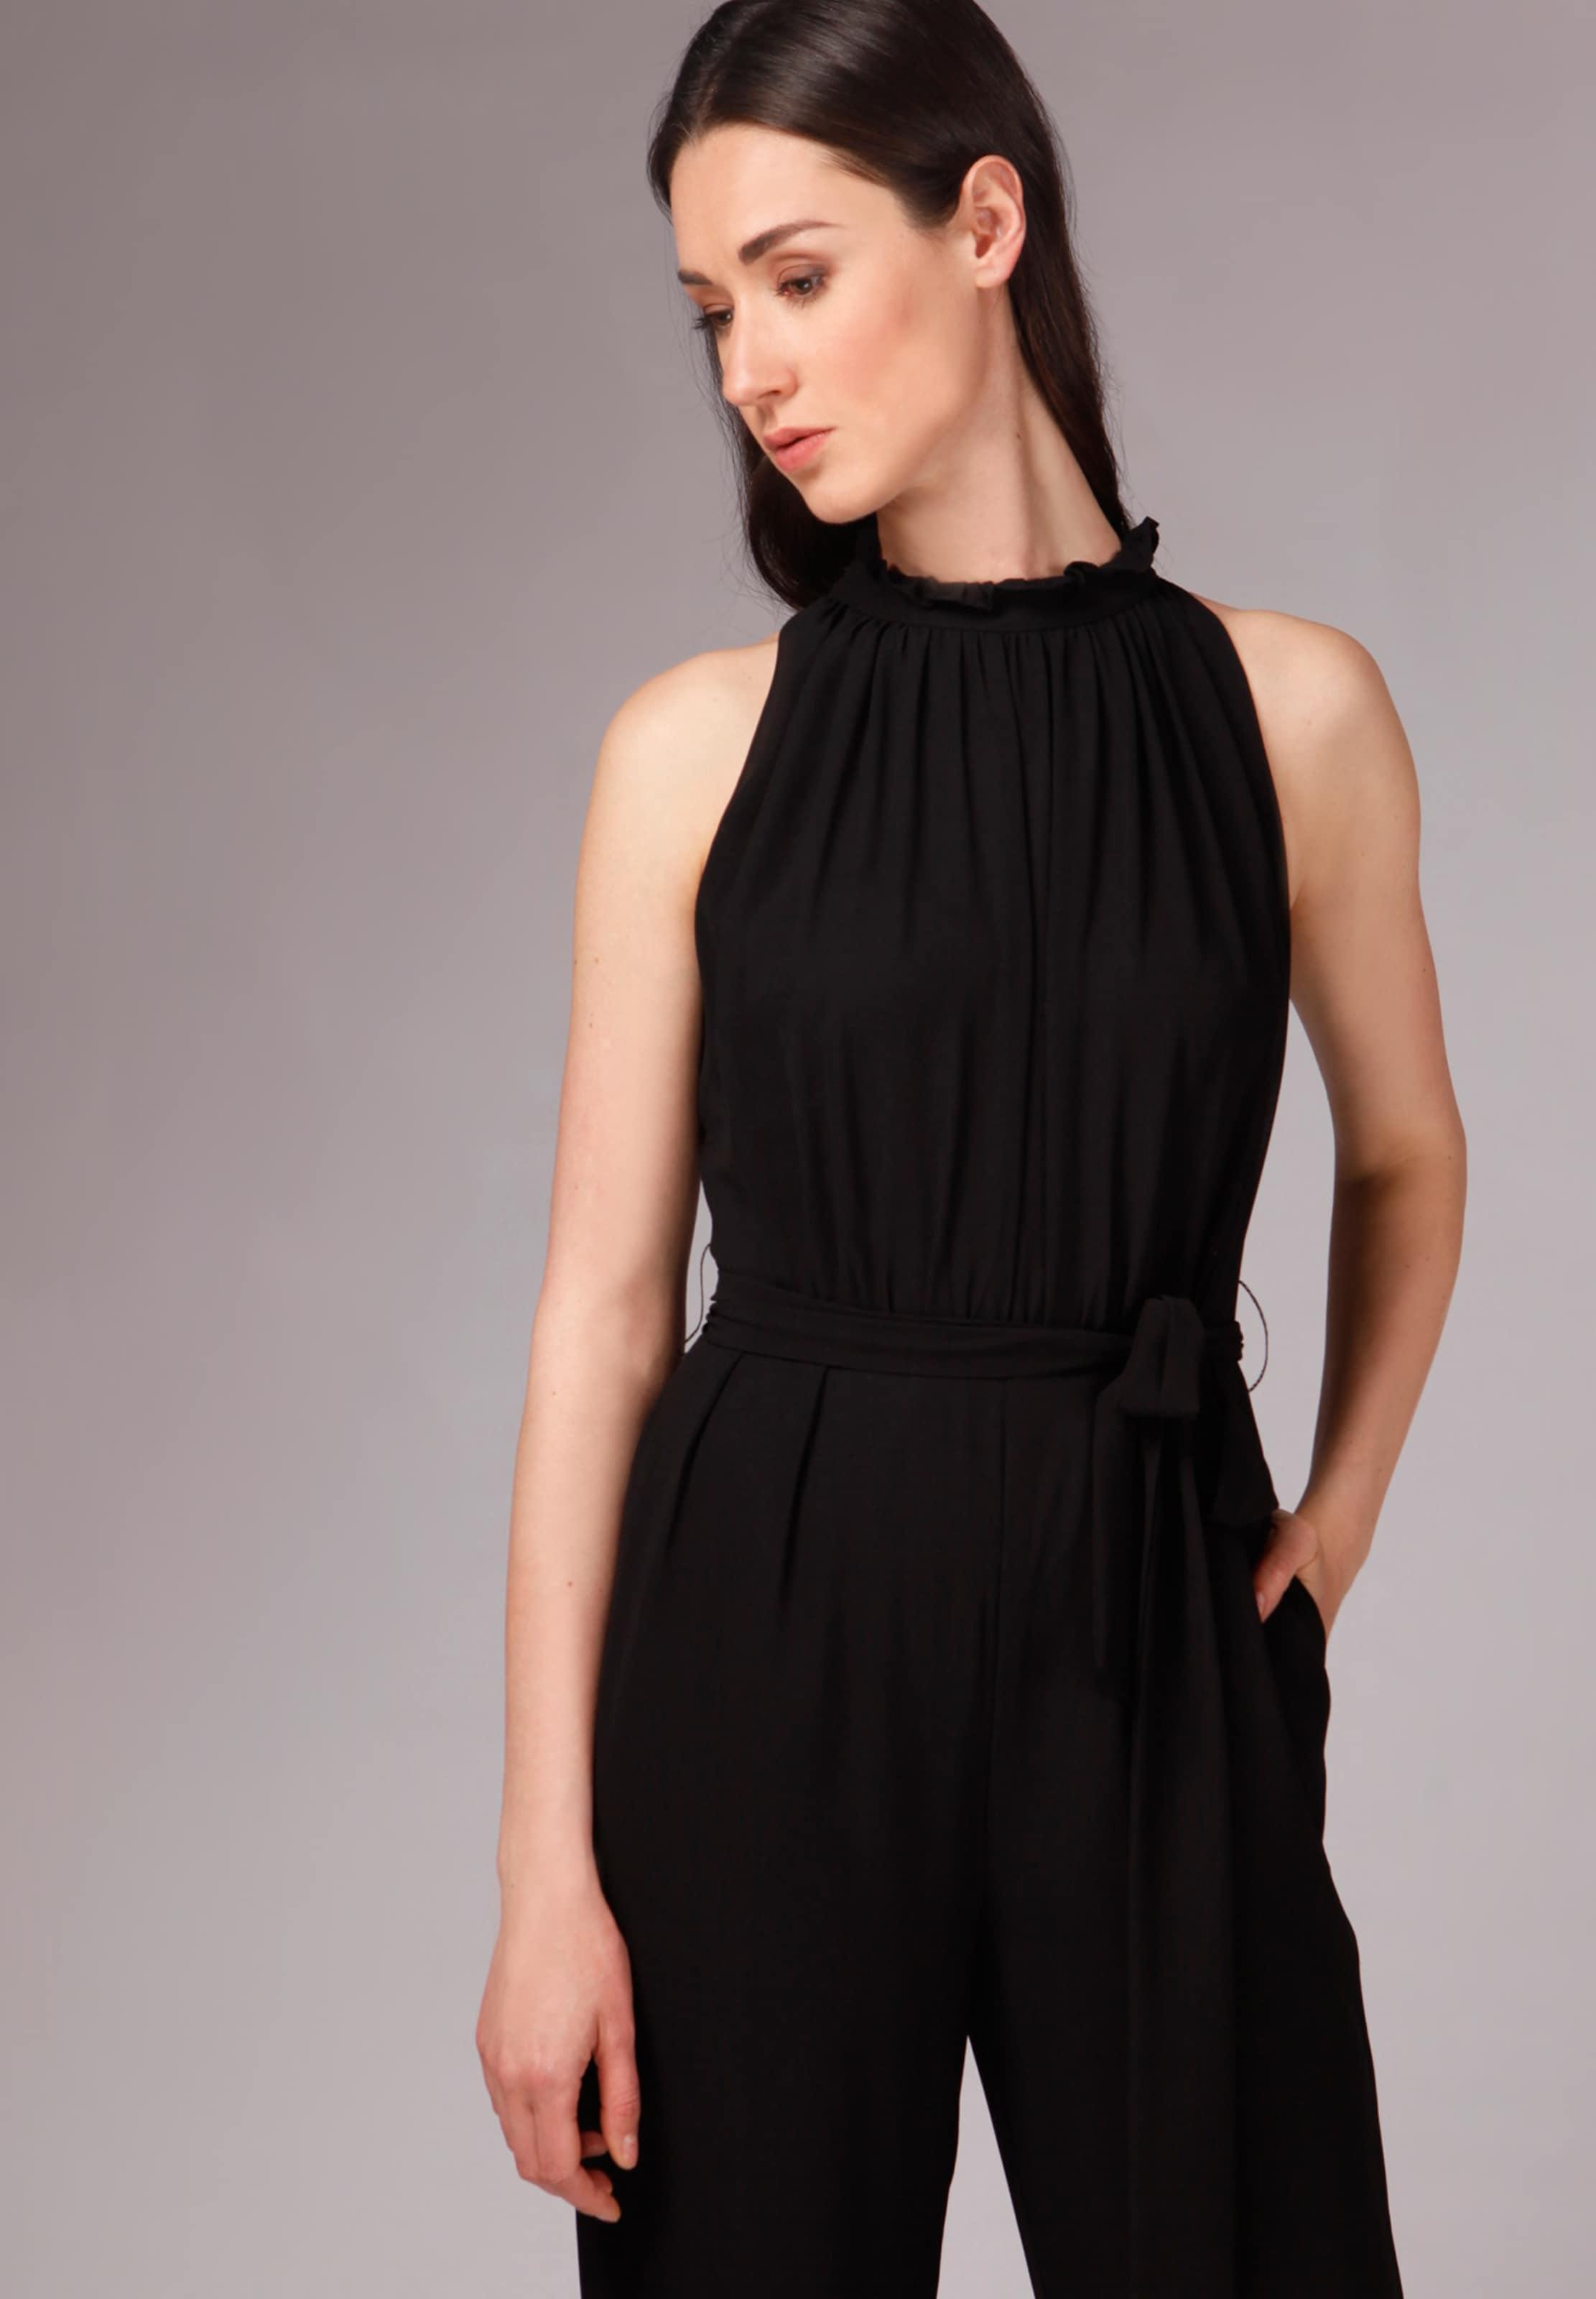 Jumpsuit Schwarz Couture Young Barbara Schwarzer In By dxoCeWrBQ